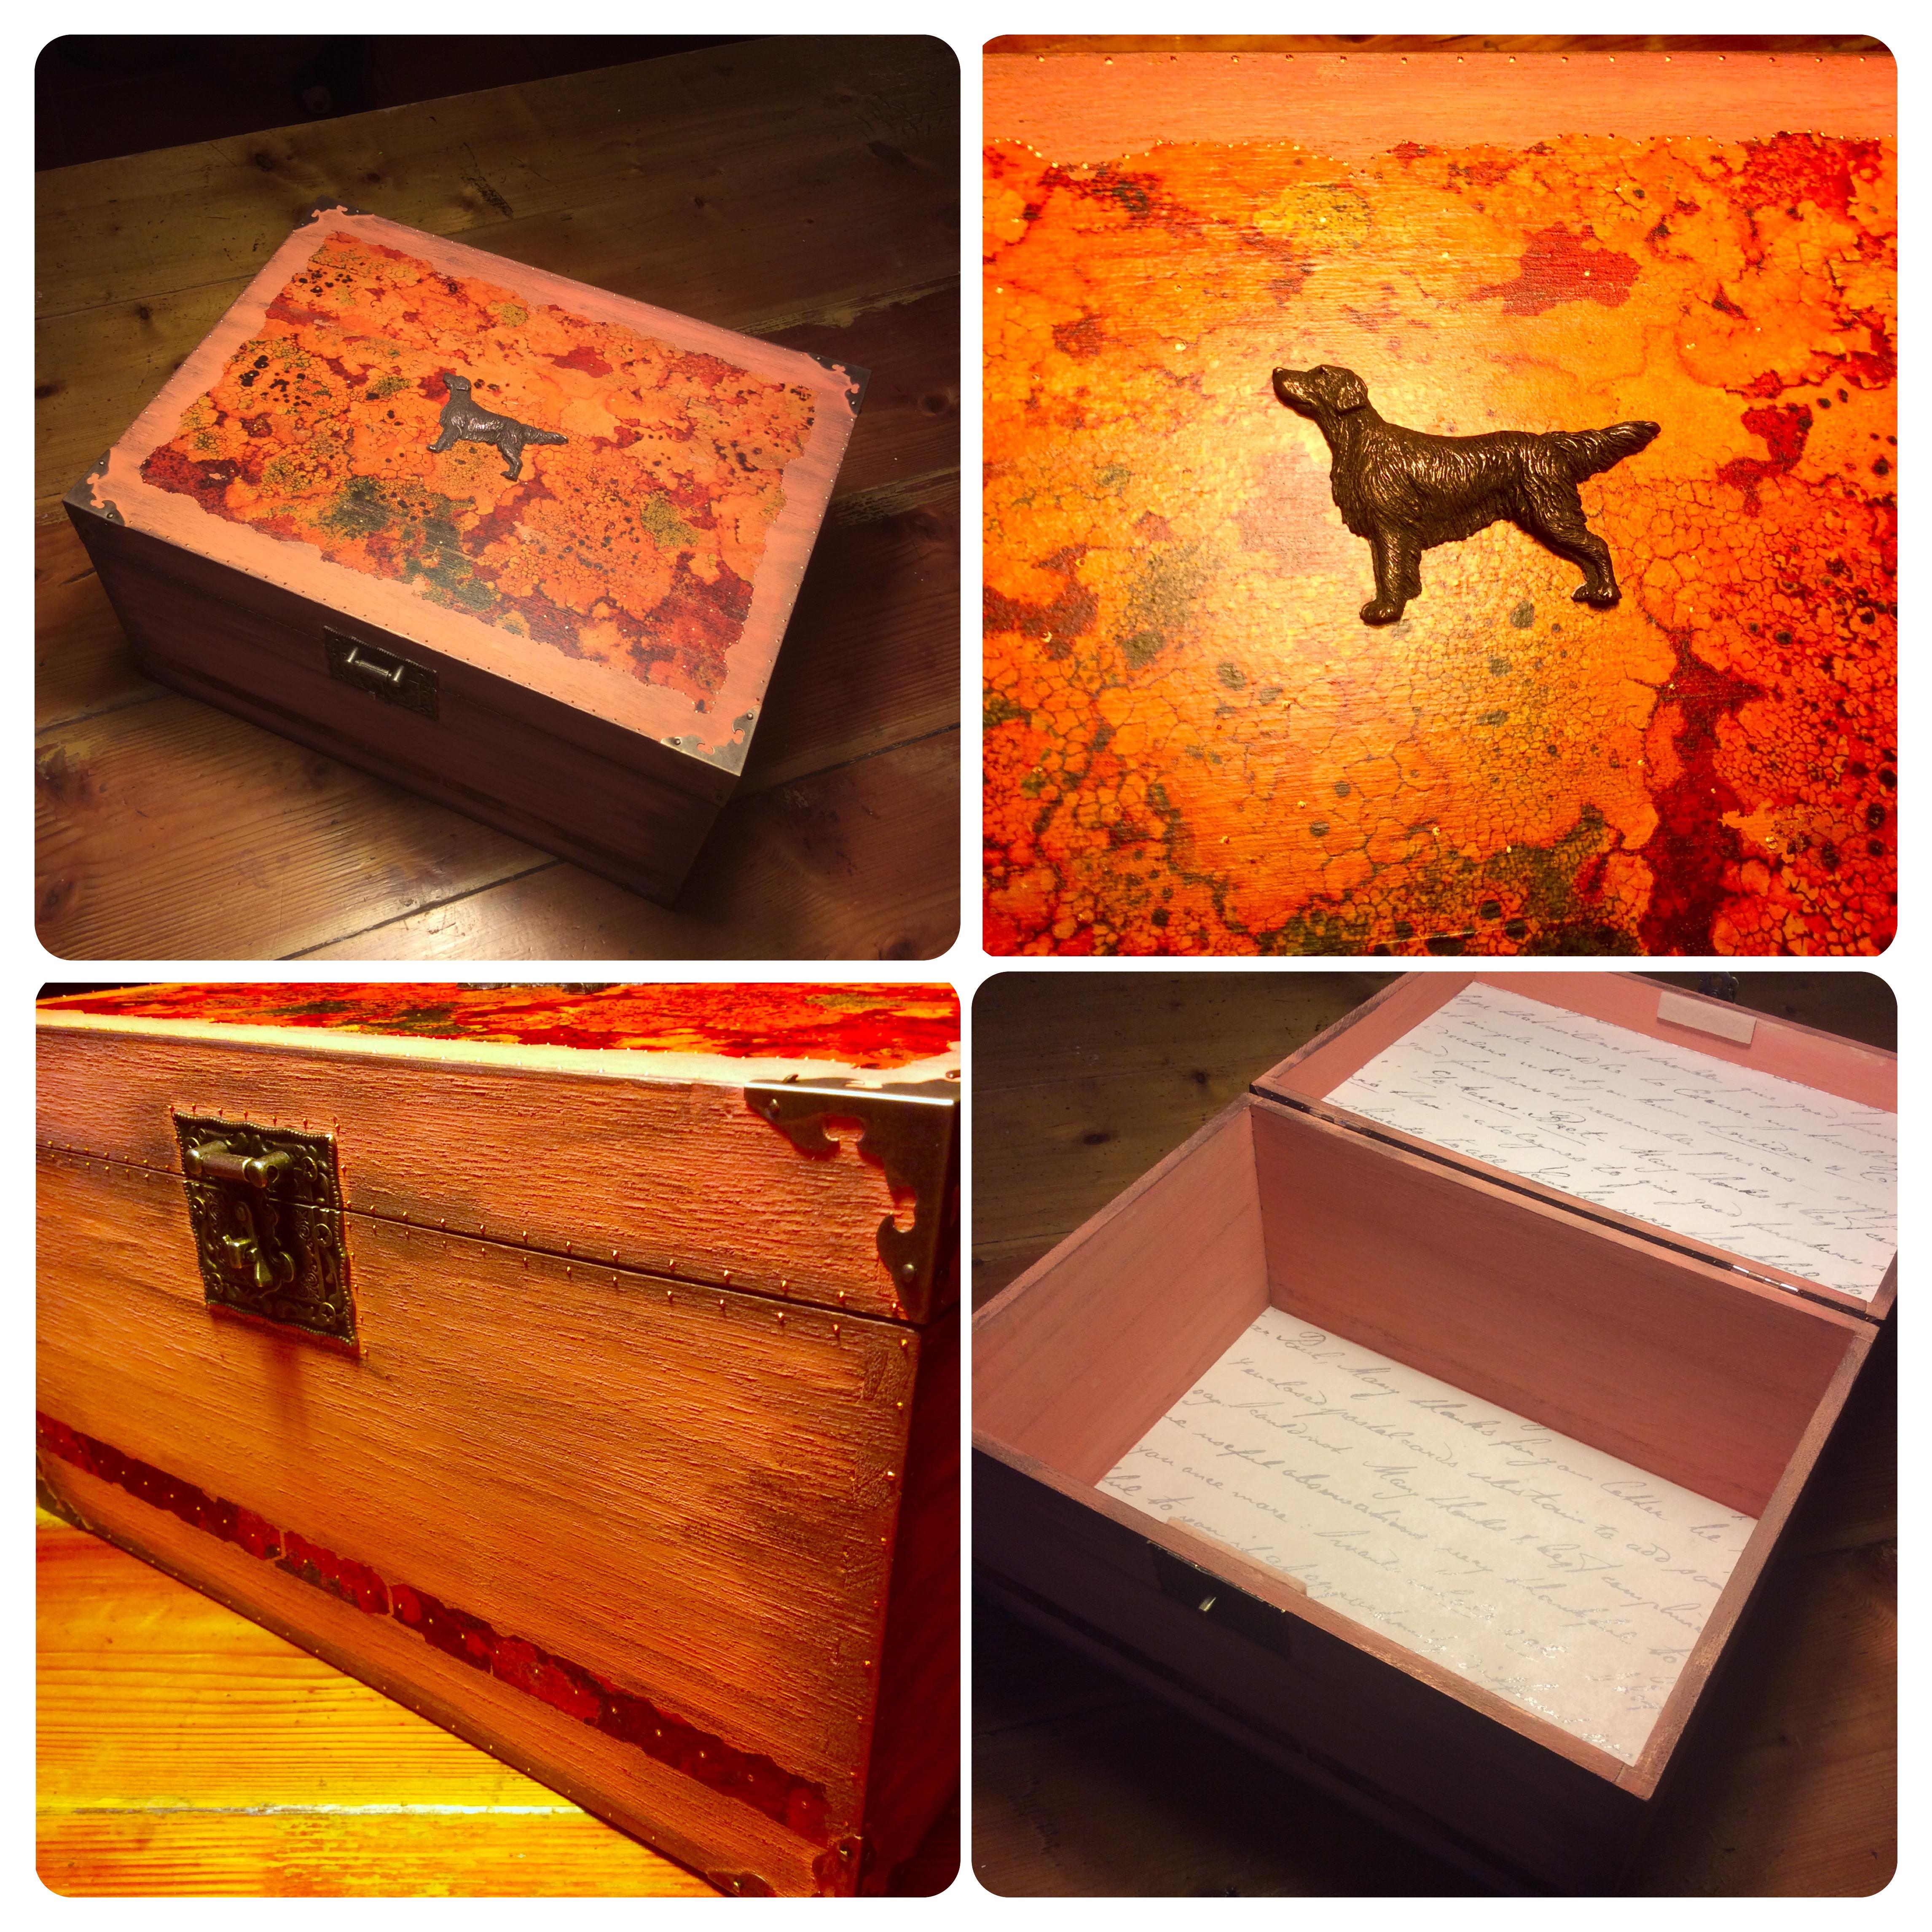 Flatcoated retriever box